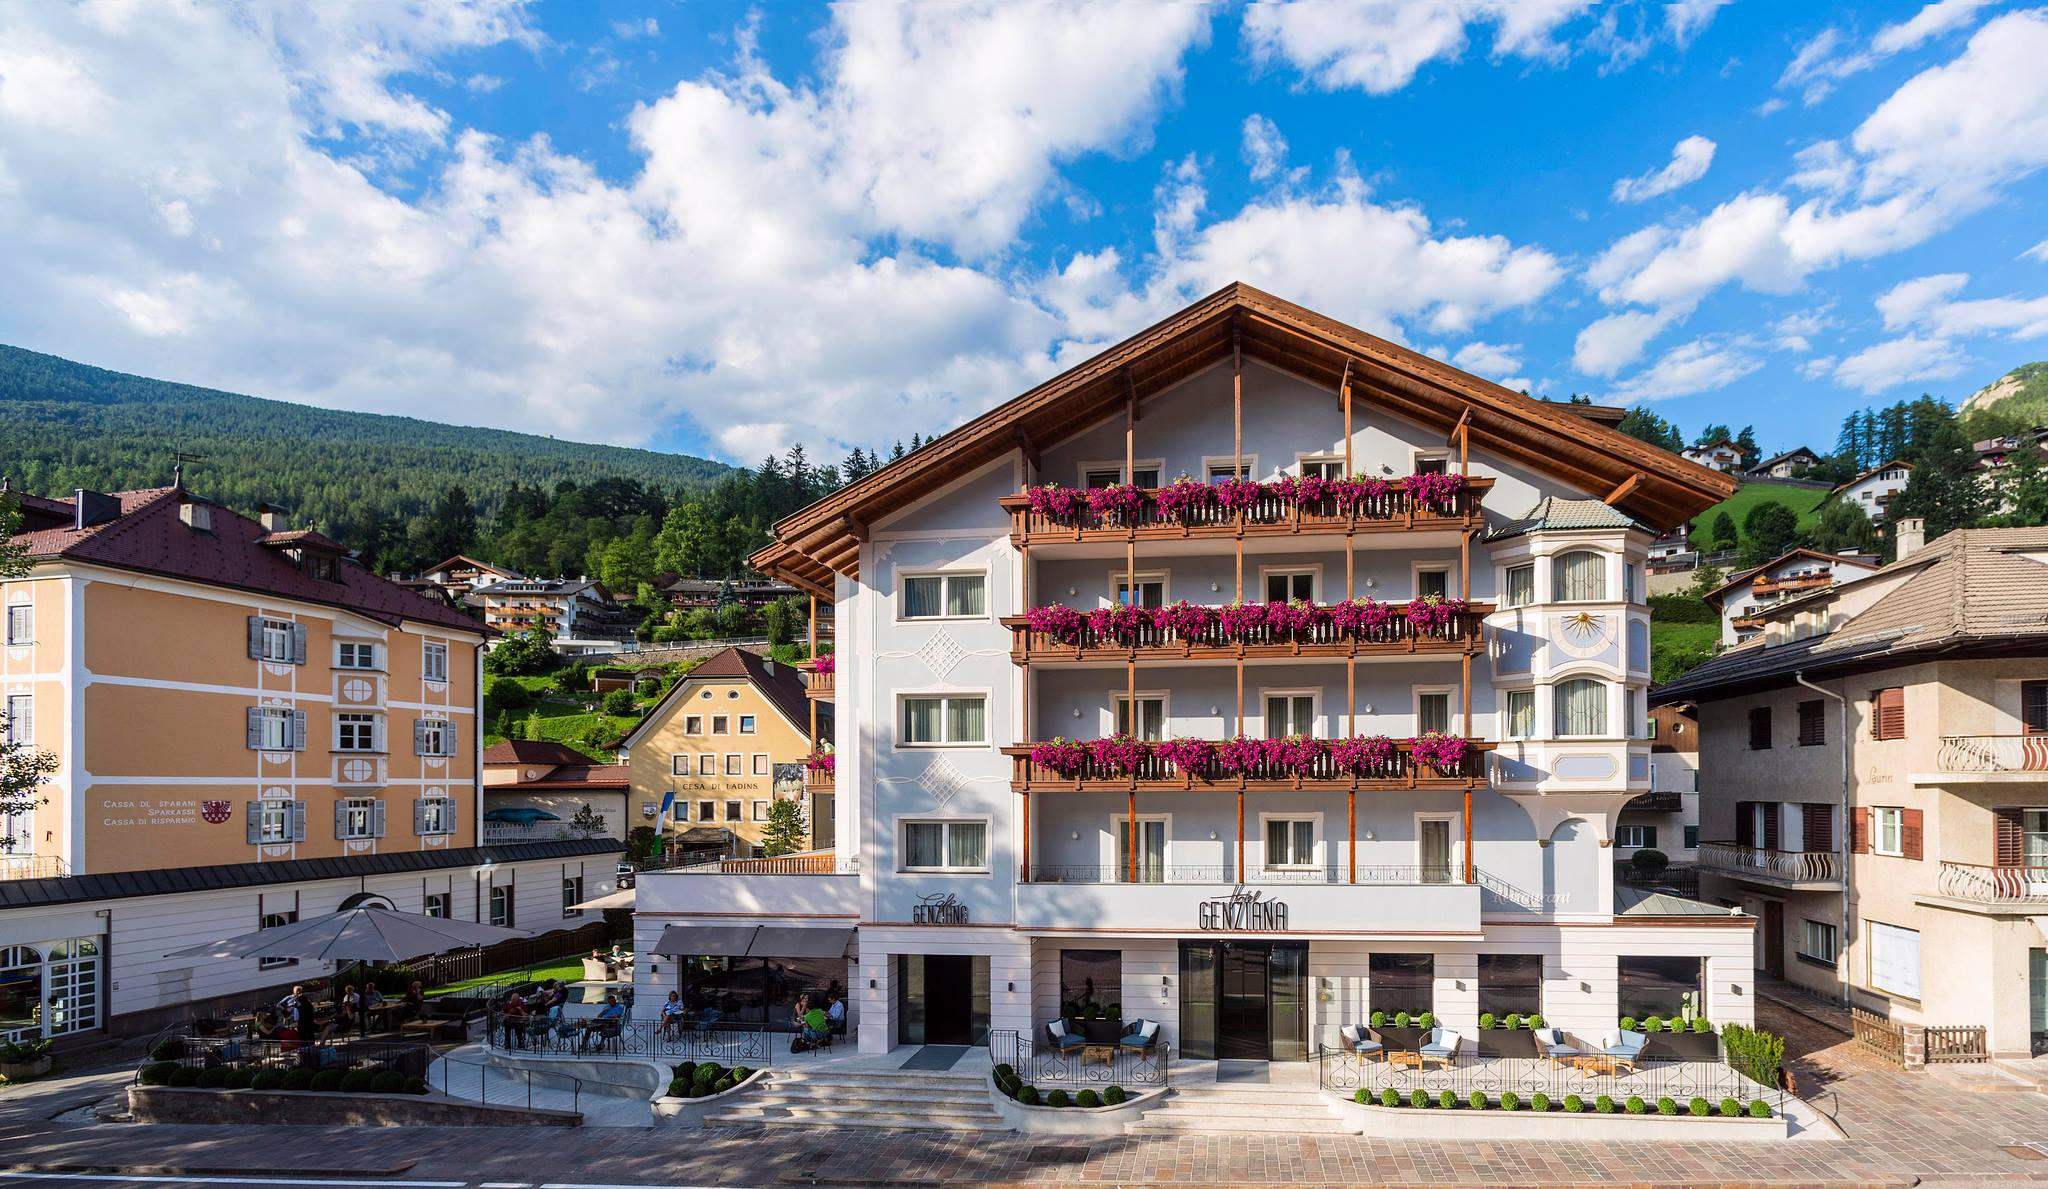 Hotel genziana ortisei 4s star hotel val gardena for Design hotel val gardena